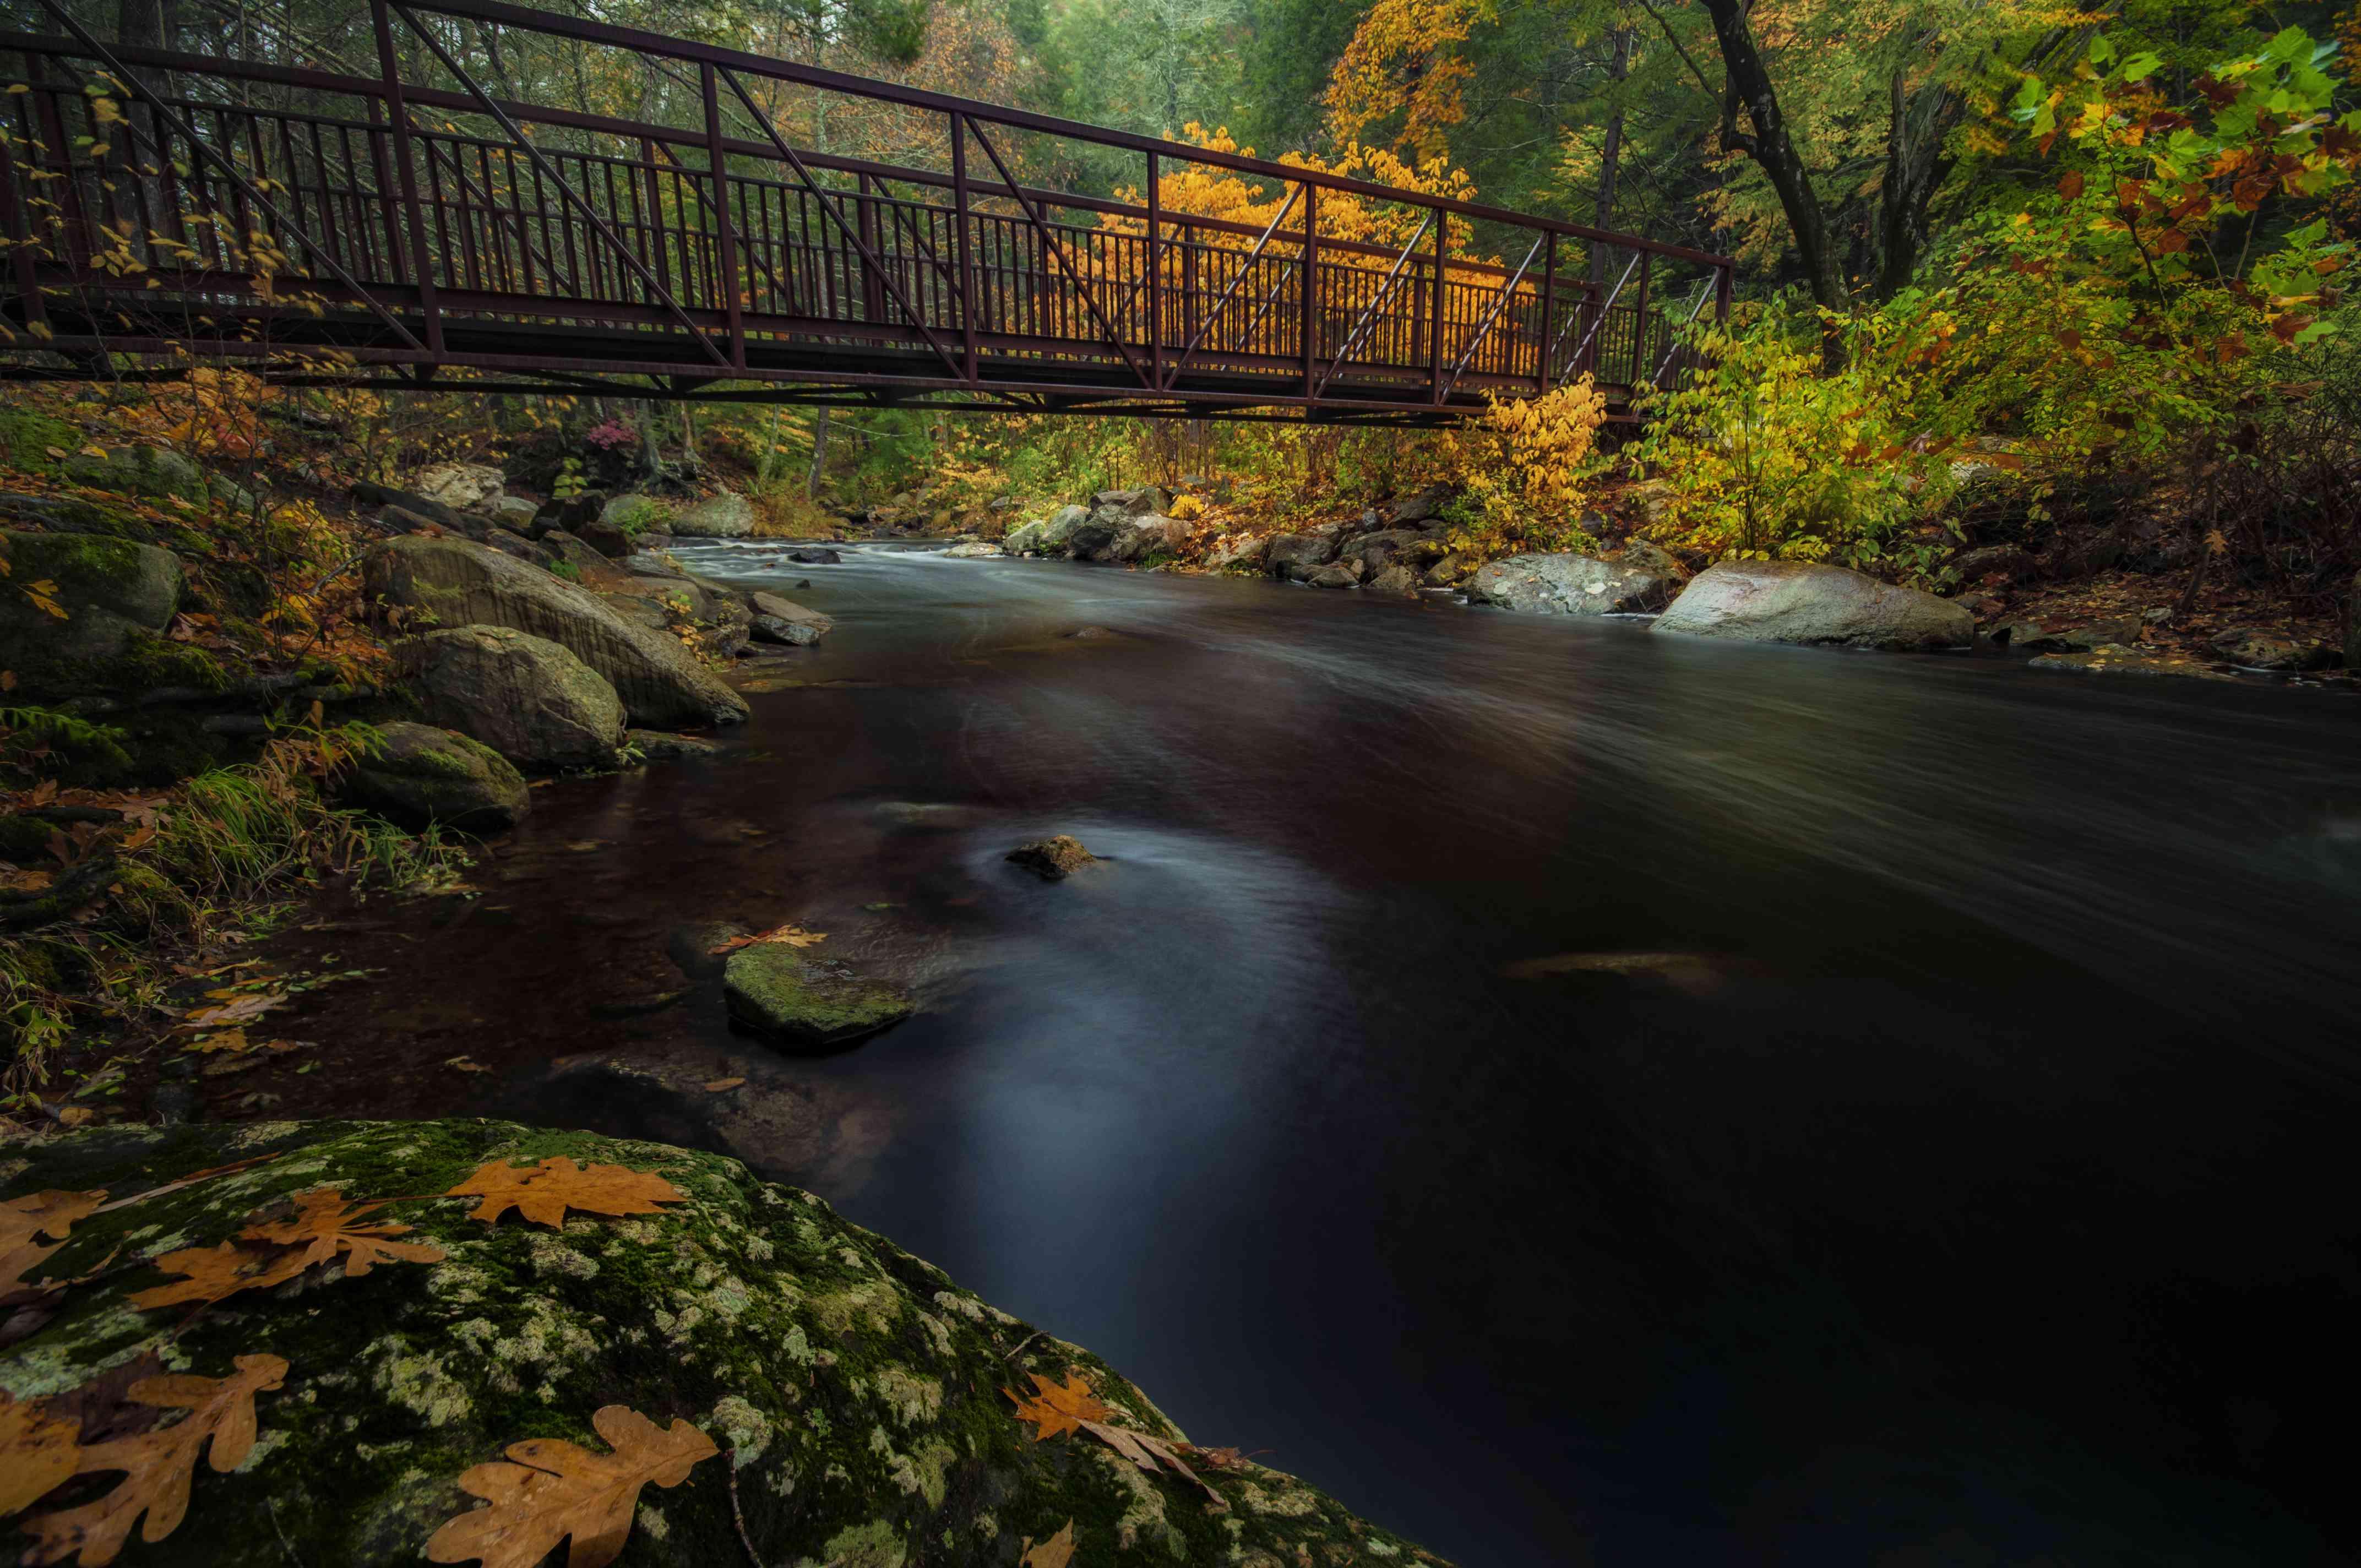 Bridge in Mashamoquet Brook State Park in fall, Connecticut